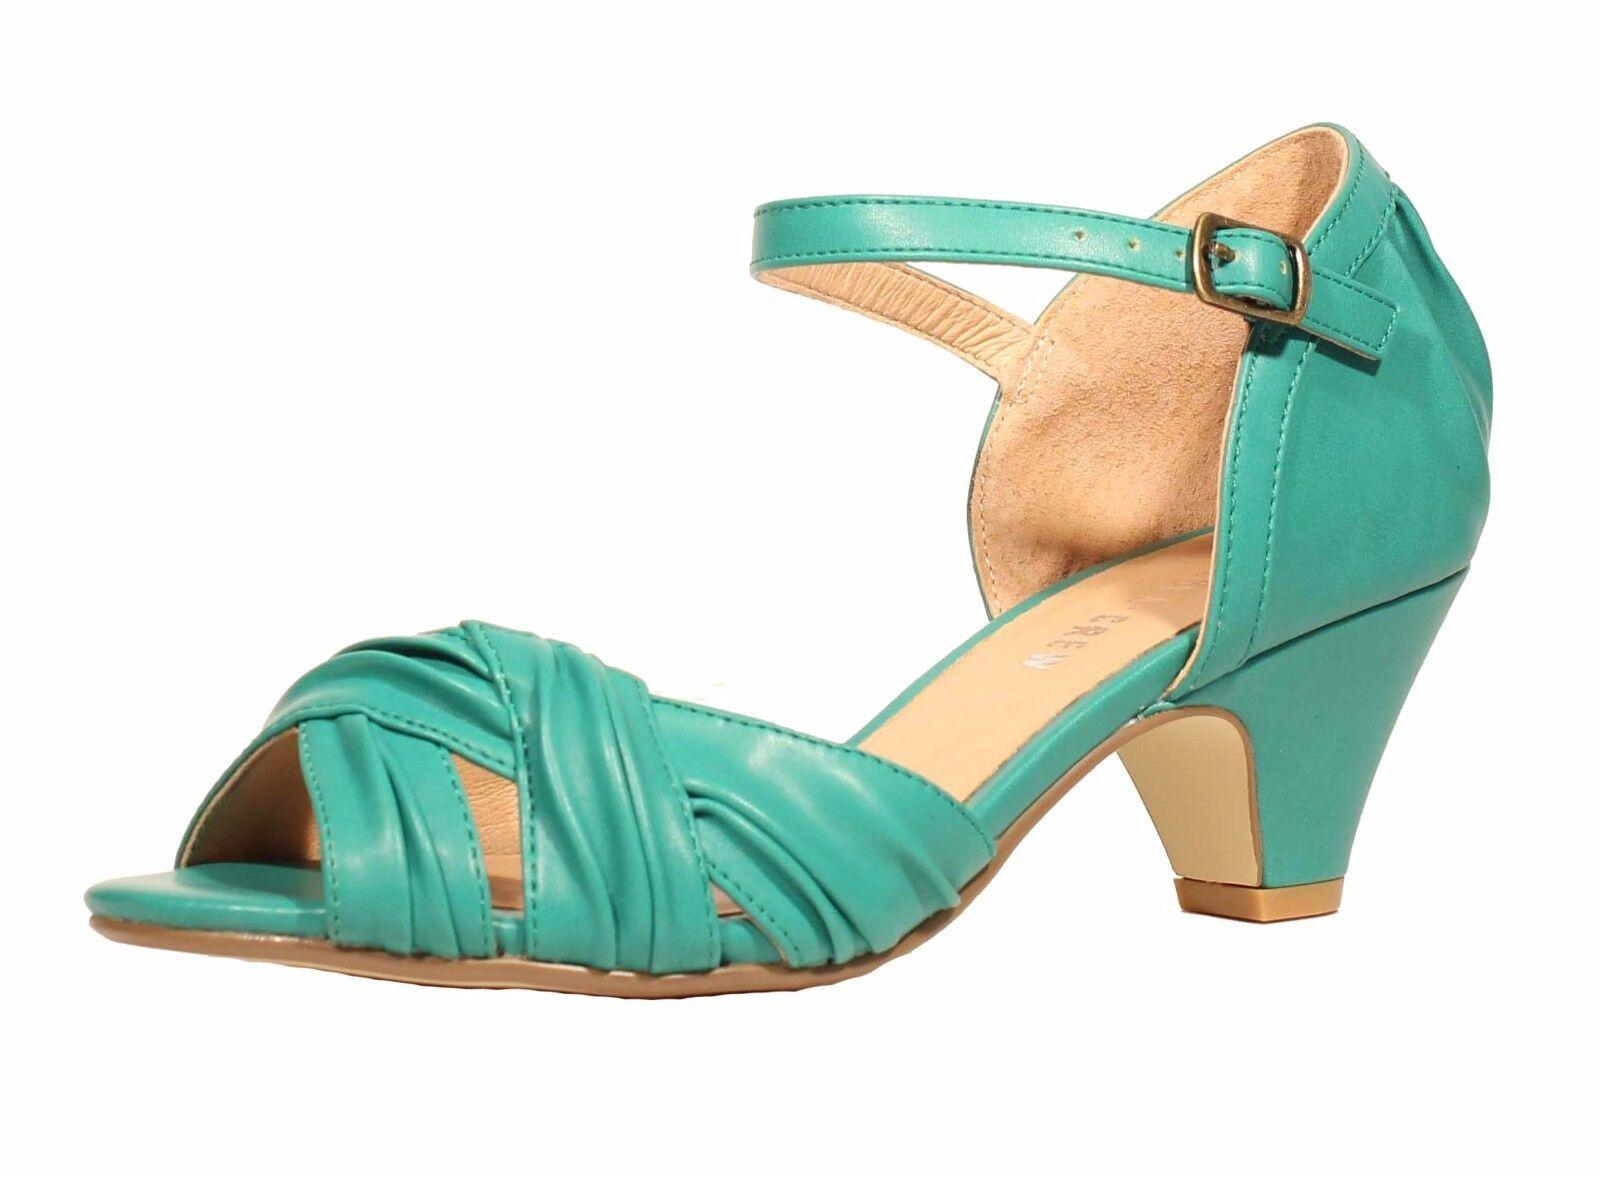 Chelsea Peep-Toe Crew Nadia Low Heel Peep-Toe Chelsea Cutout Sandal 8a3358